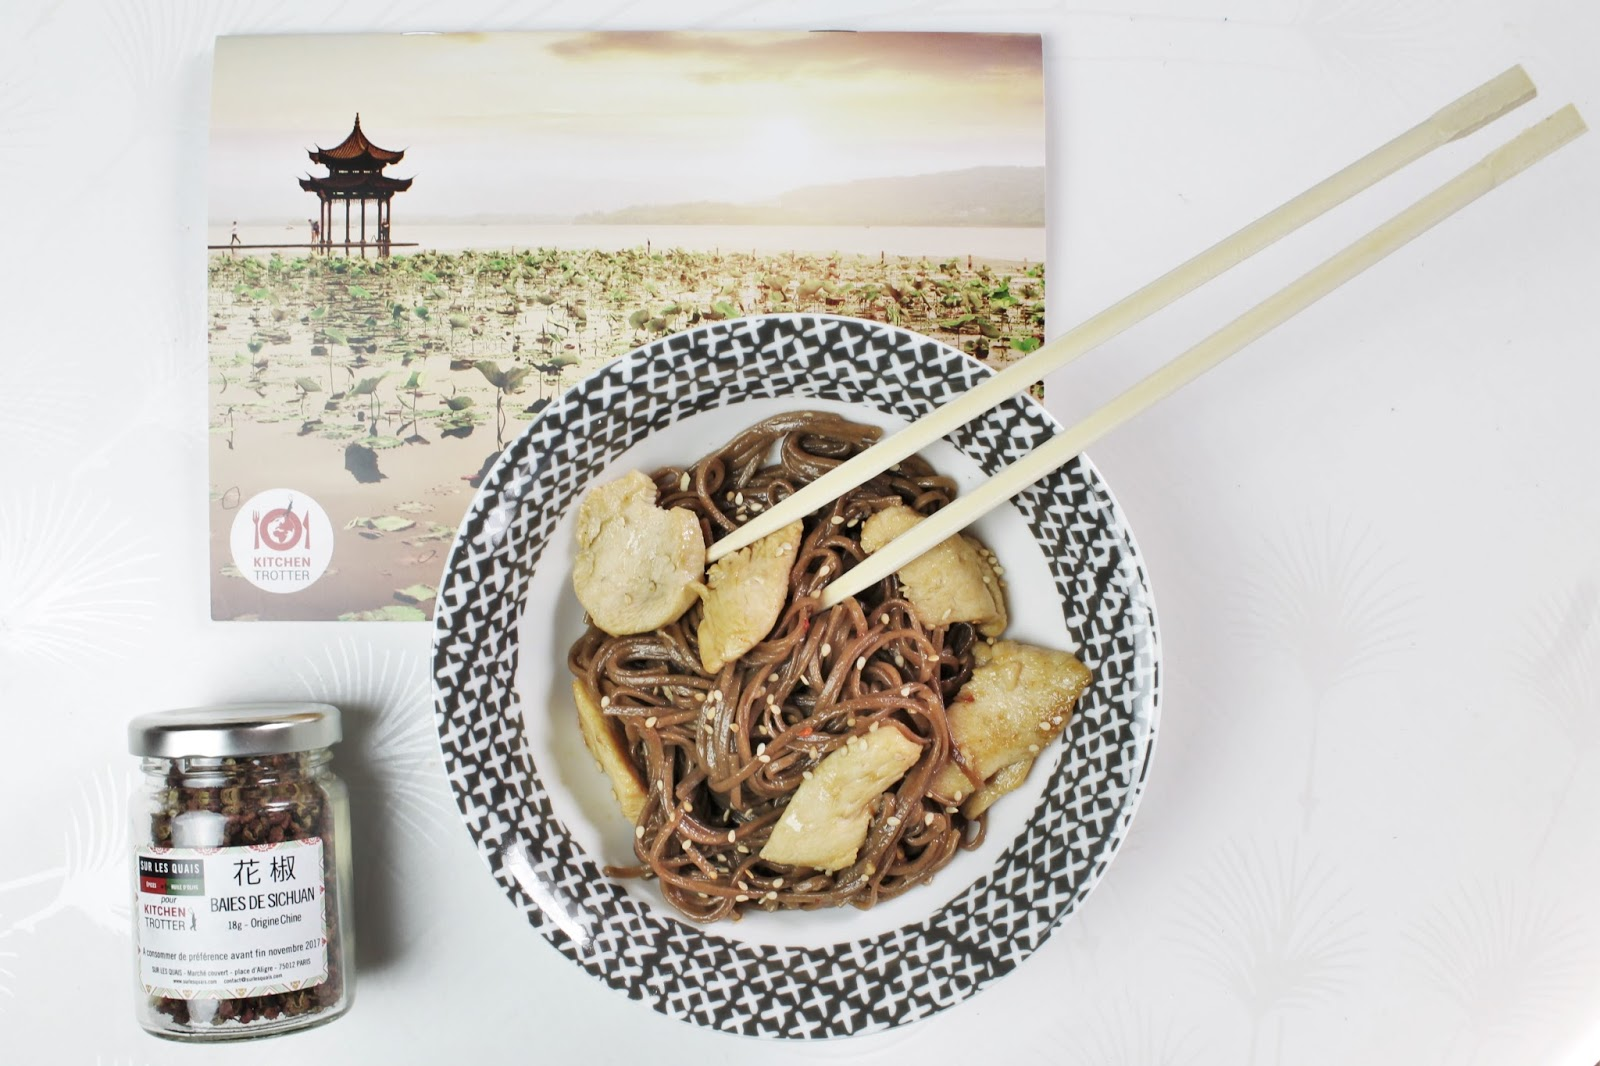 kitchen trotter kitchentrotter cuisine box food chine voyage abonnement